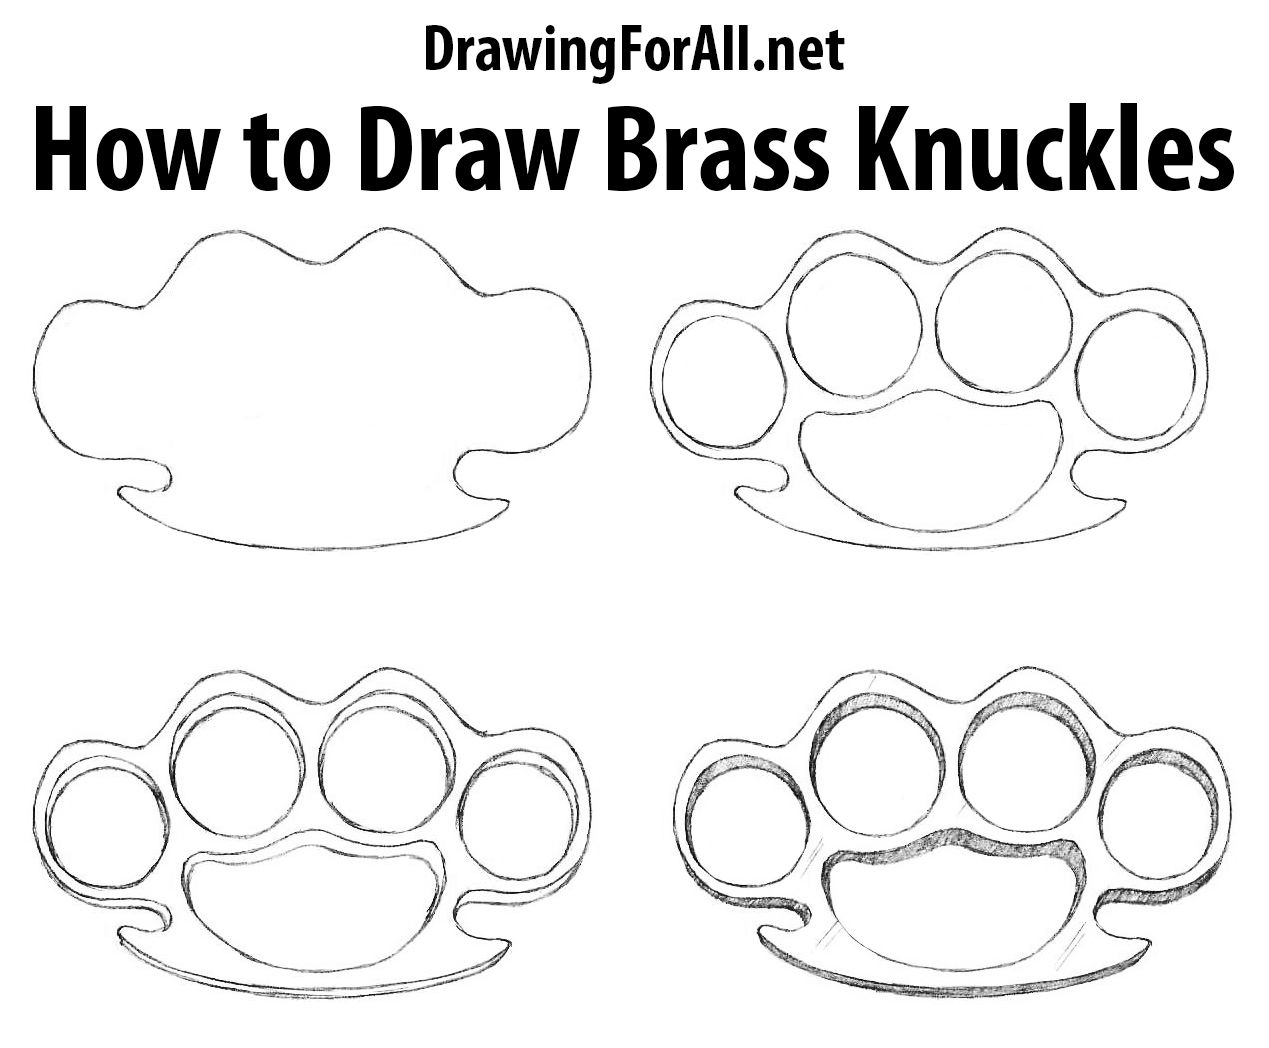 How to Draw Brass Knuckles